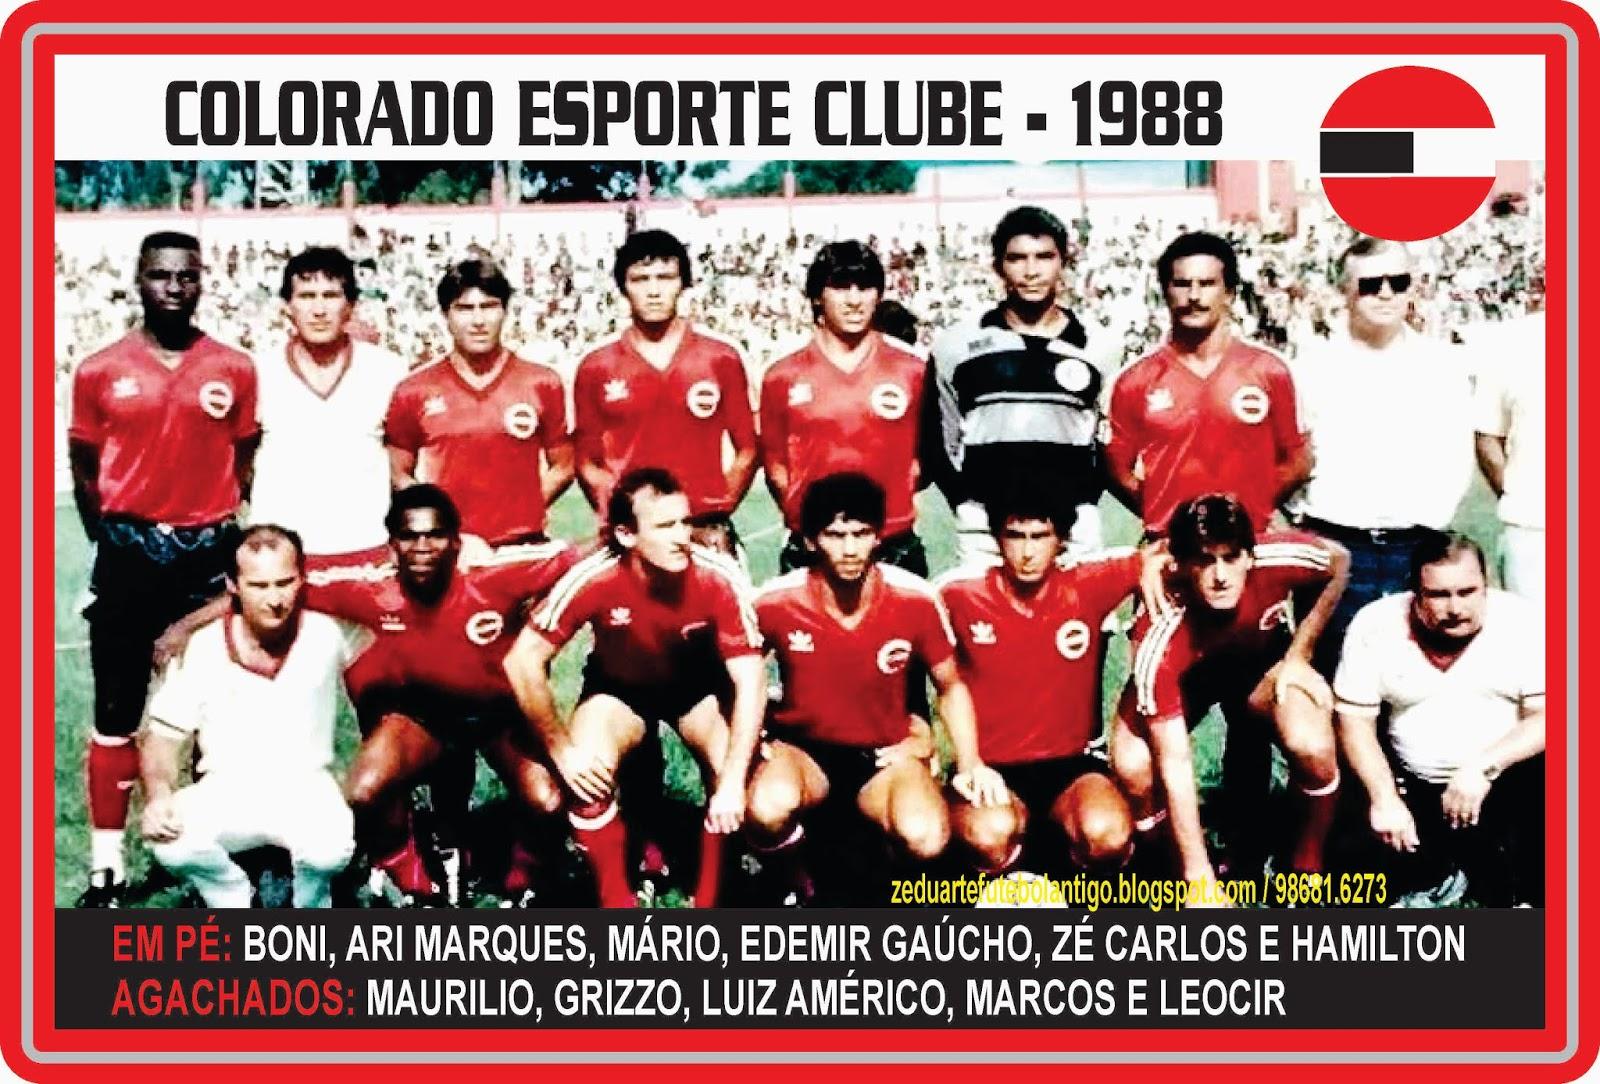 Colorado Esporte Clube - PR